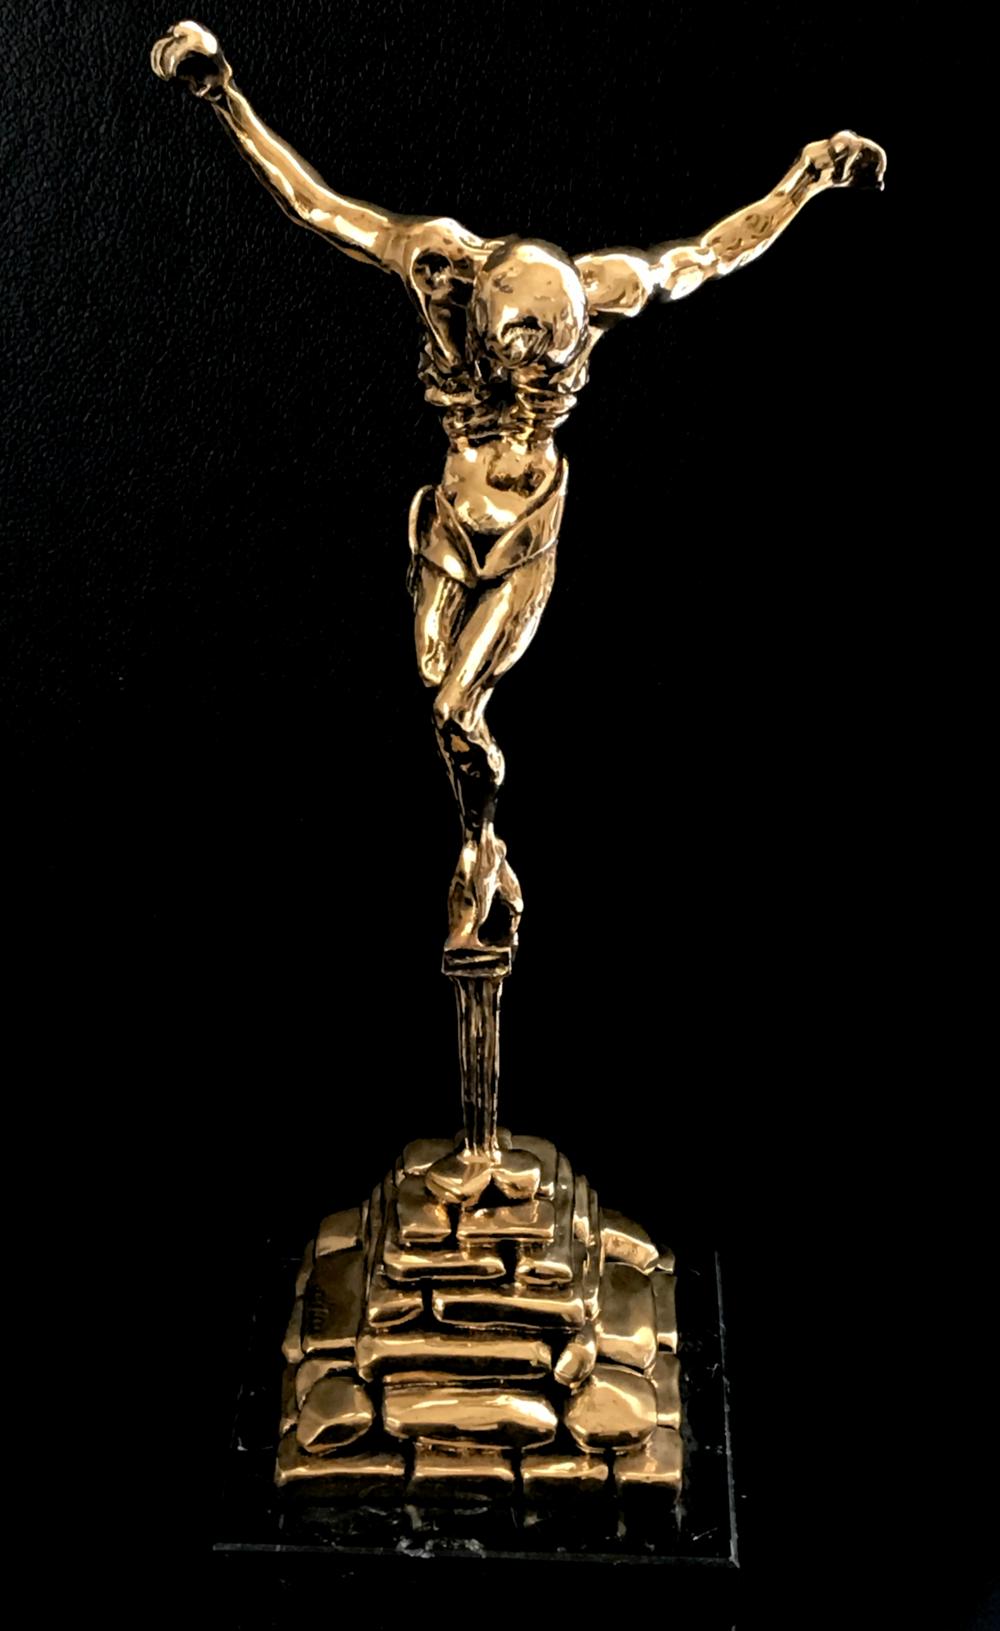 SALVADOR DALÍ   Christo de San Juan de la Cruz [ Christ of Saint John the Cross ], c. 1970  Original bronze patinated sculpture, on black marble base. Signed by the artist. Edition of 350. 43.7 x 21 cm  Accompanied by a certificate of authenticity.  £4,500   enquire >